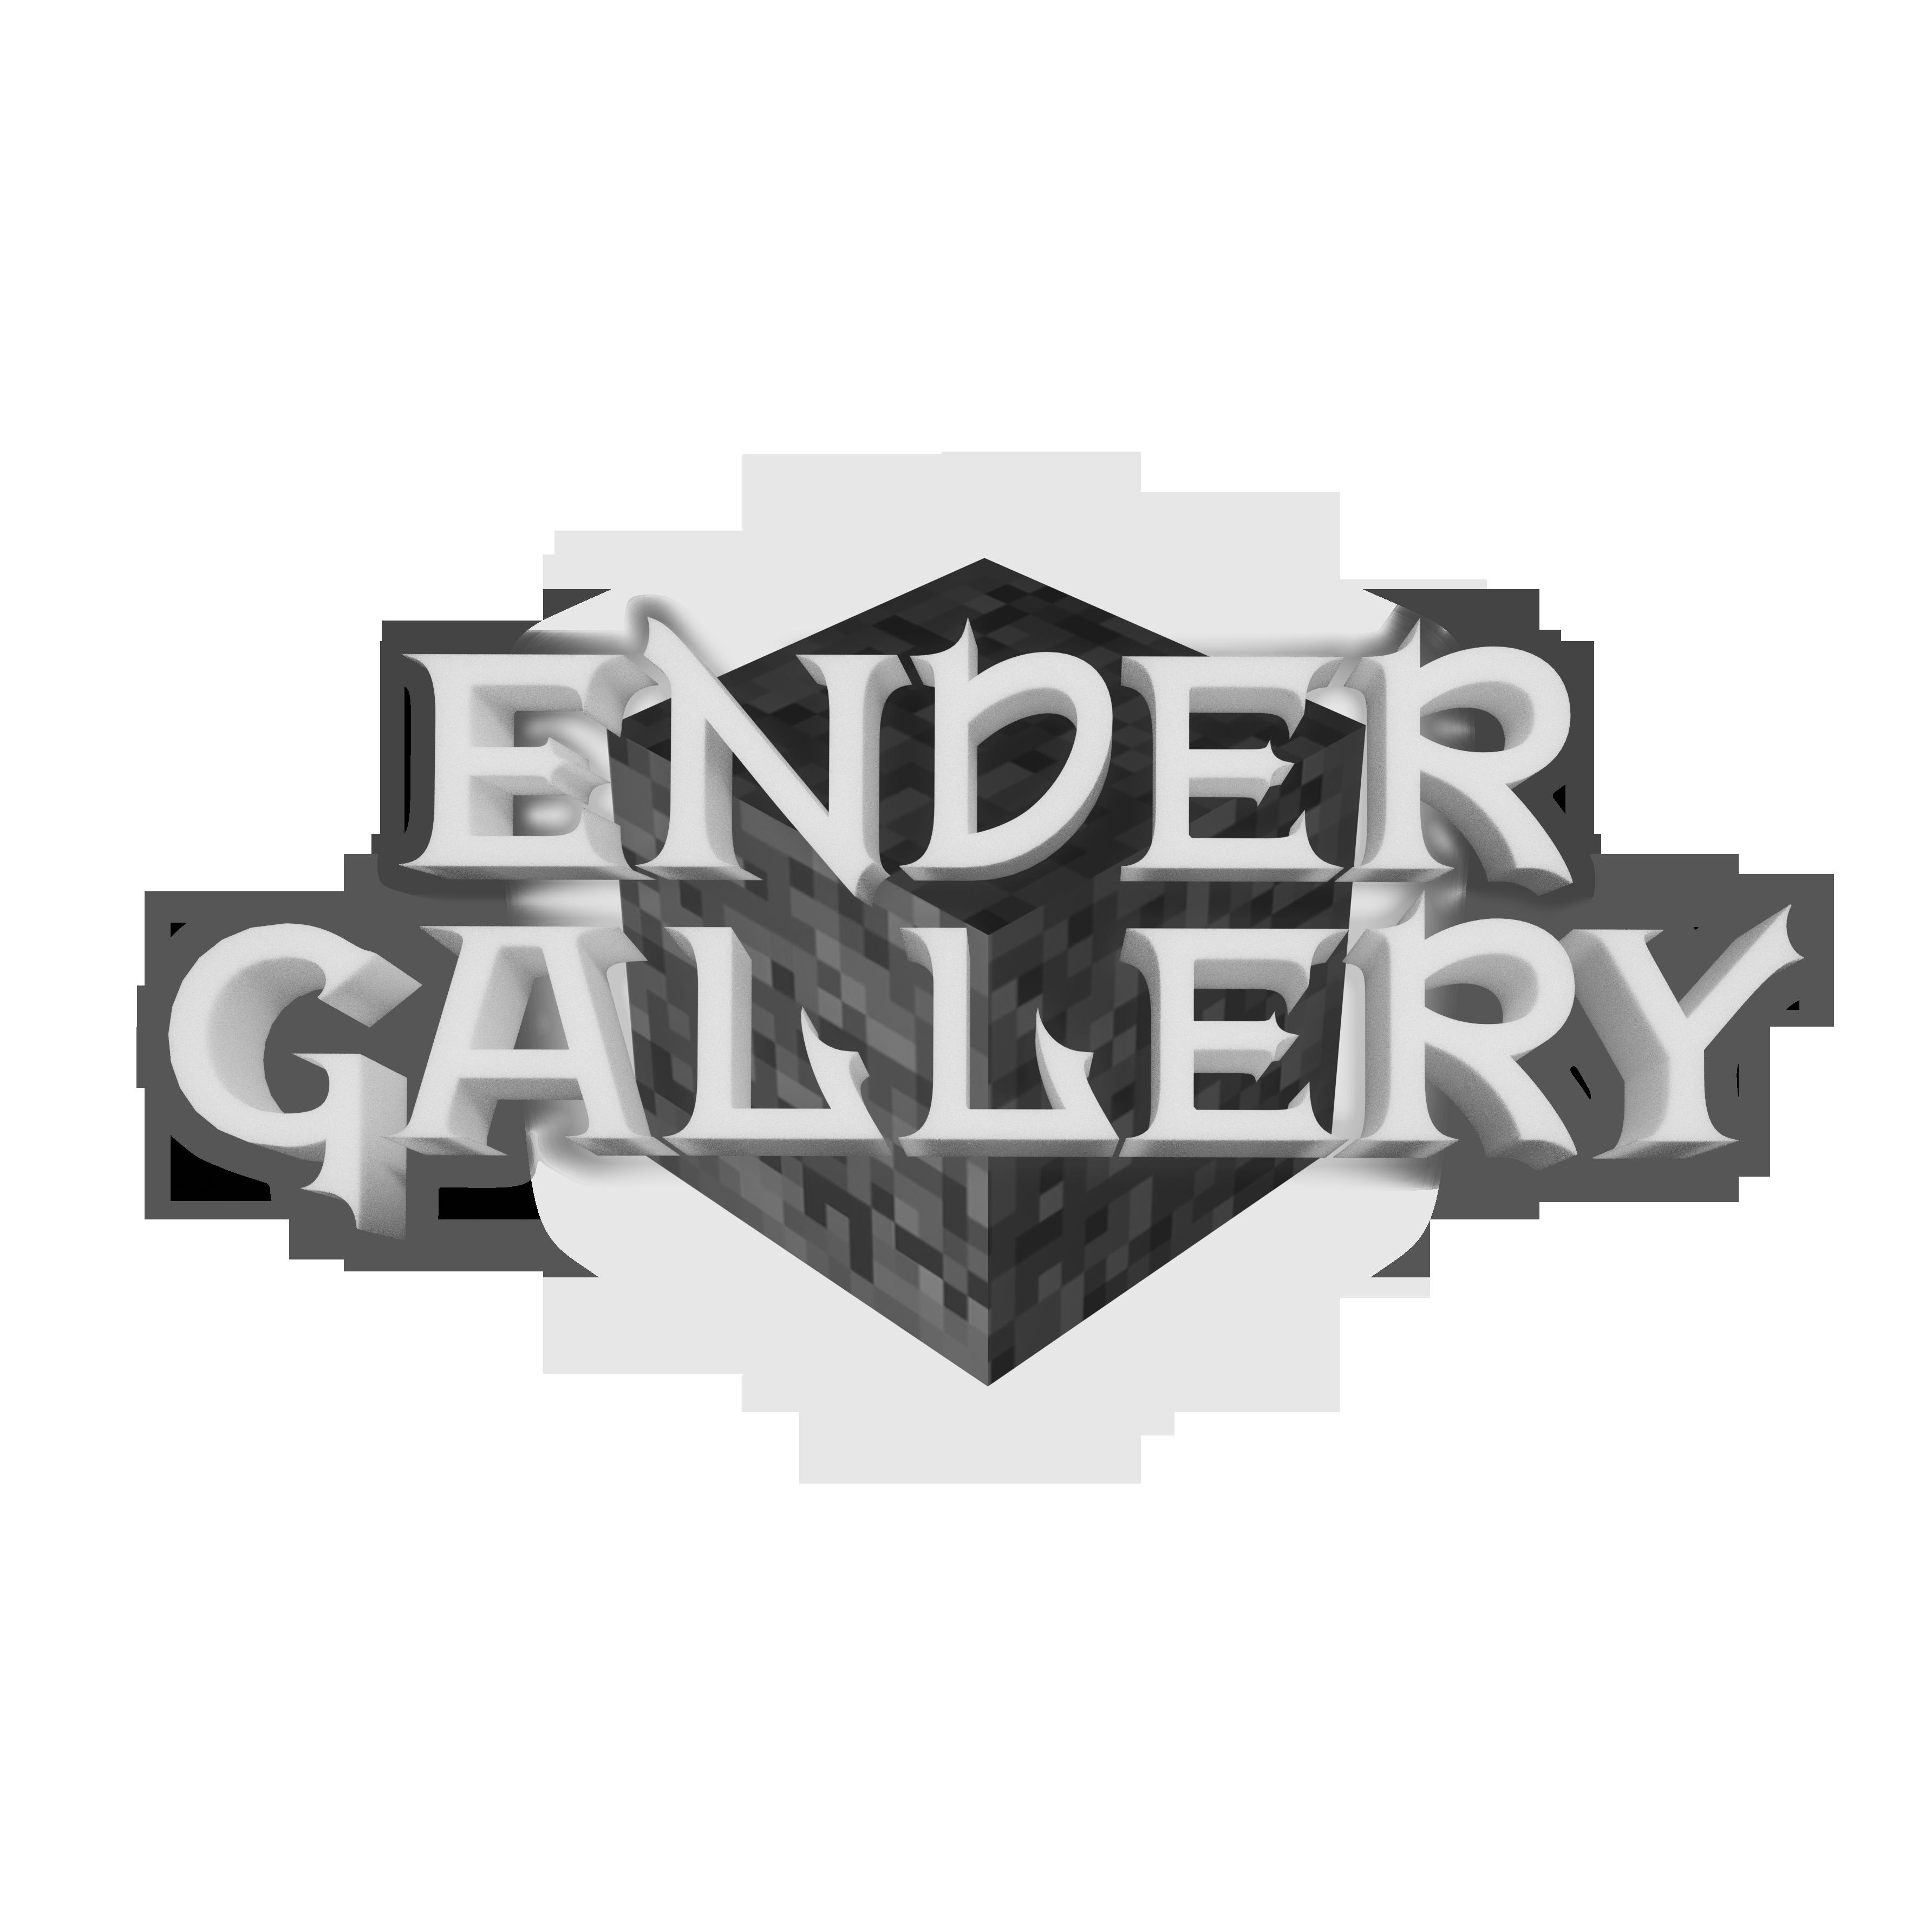 Ender Gallery logo